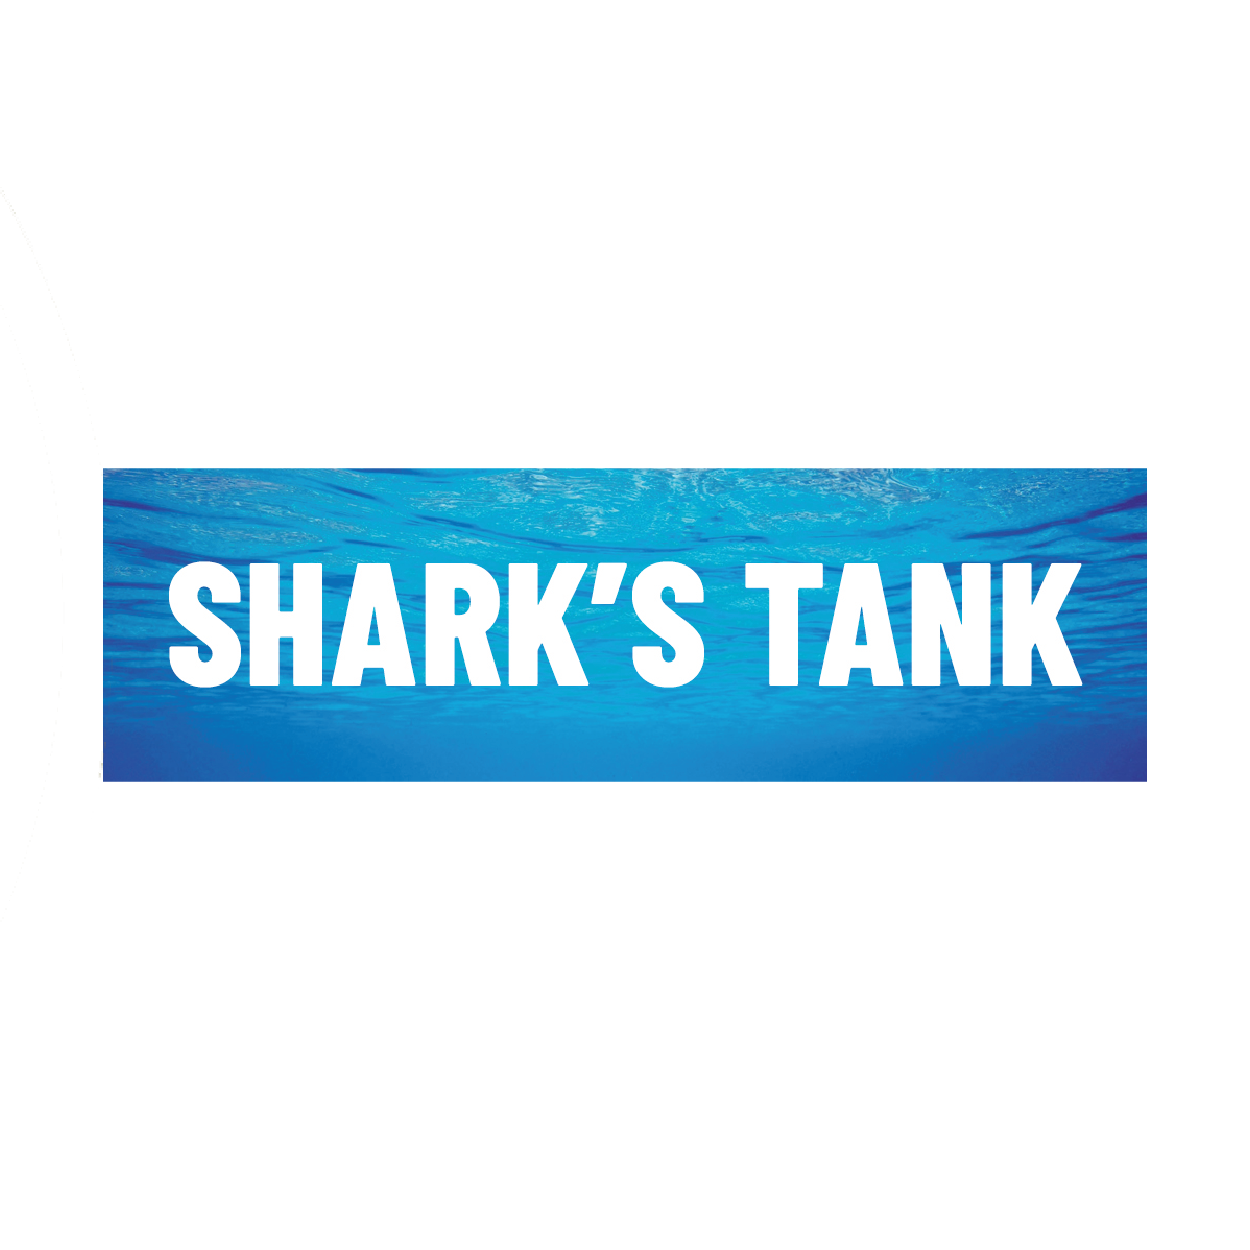 Shark's Tank